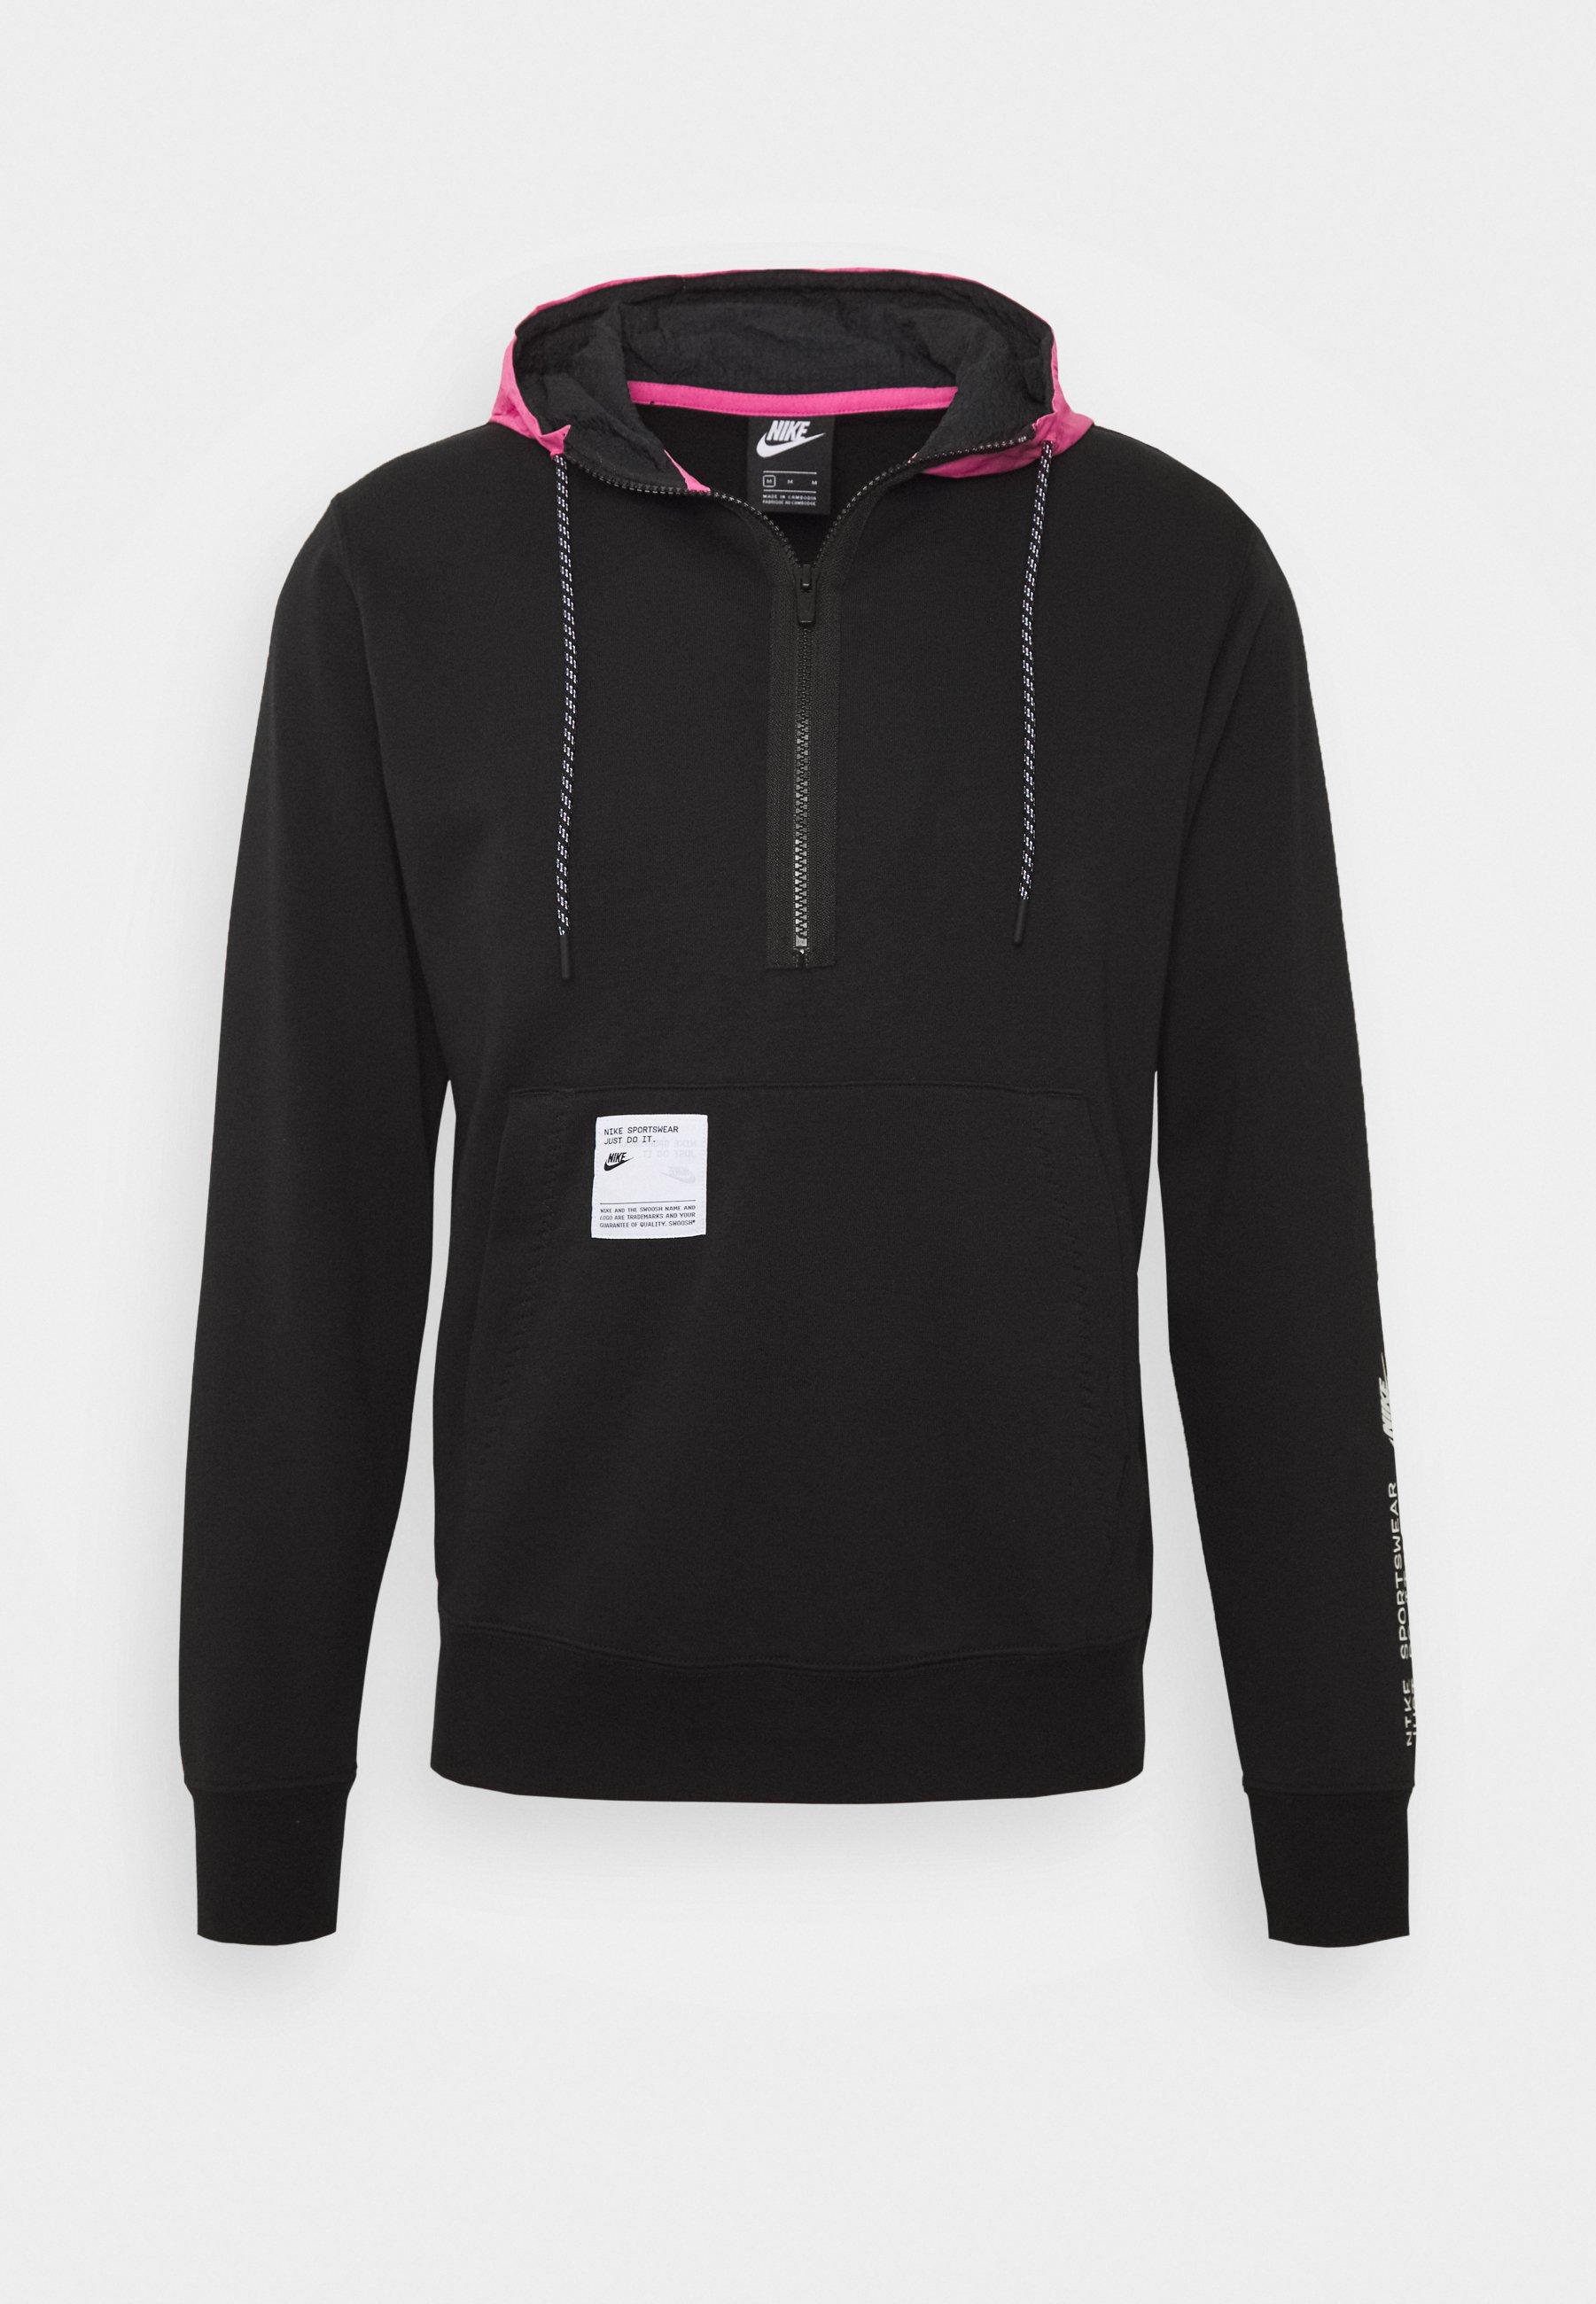 Nike Sportswear JUST DO IT Hoodie Pink, Herren   Schuhdealer